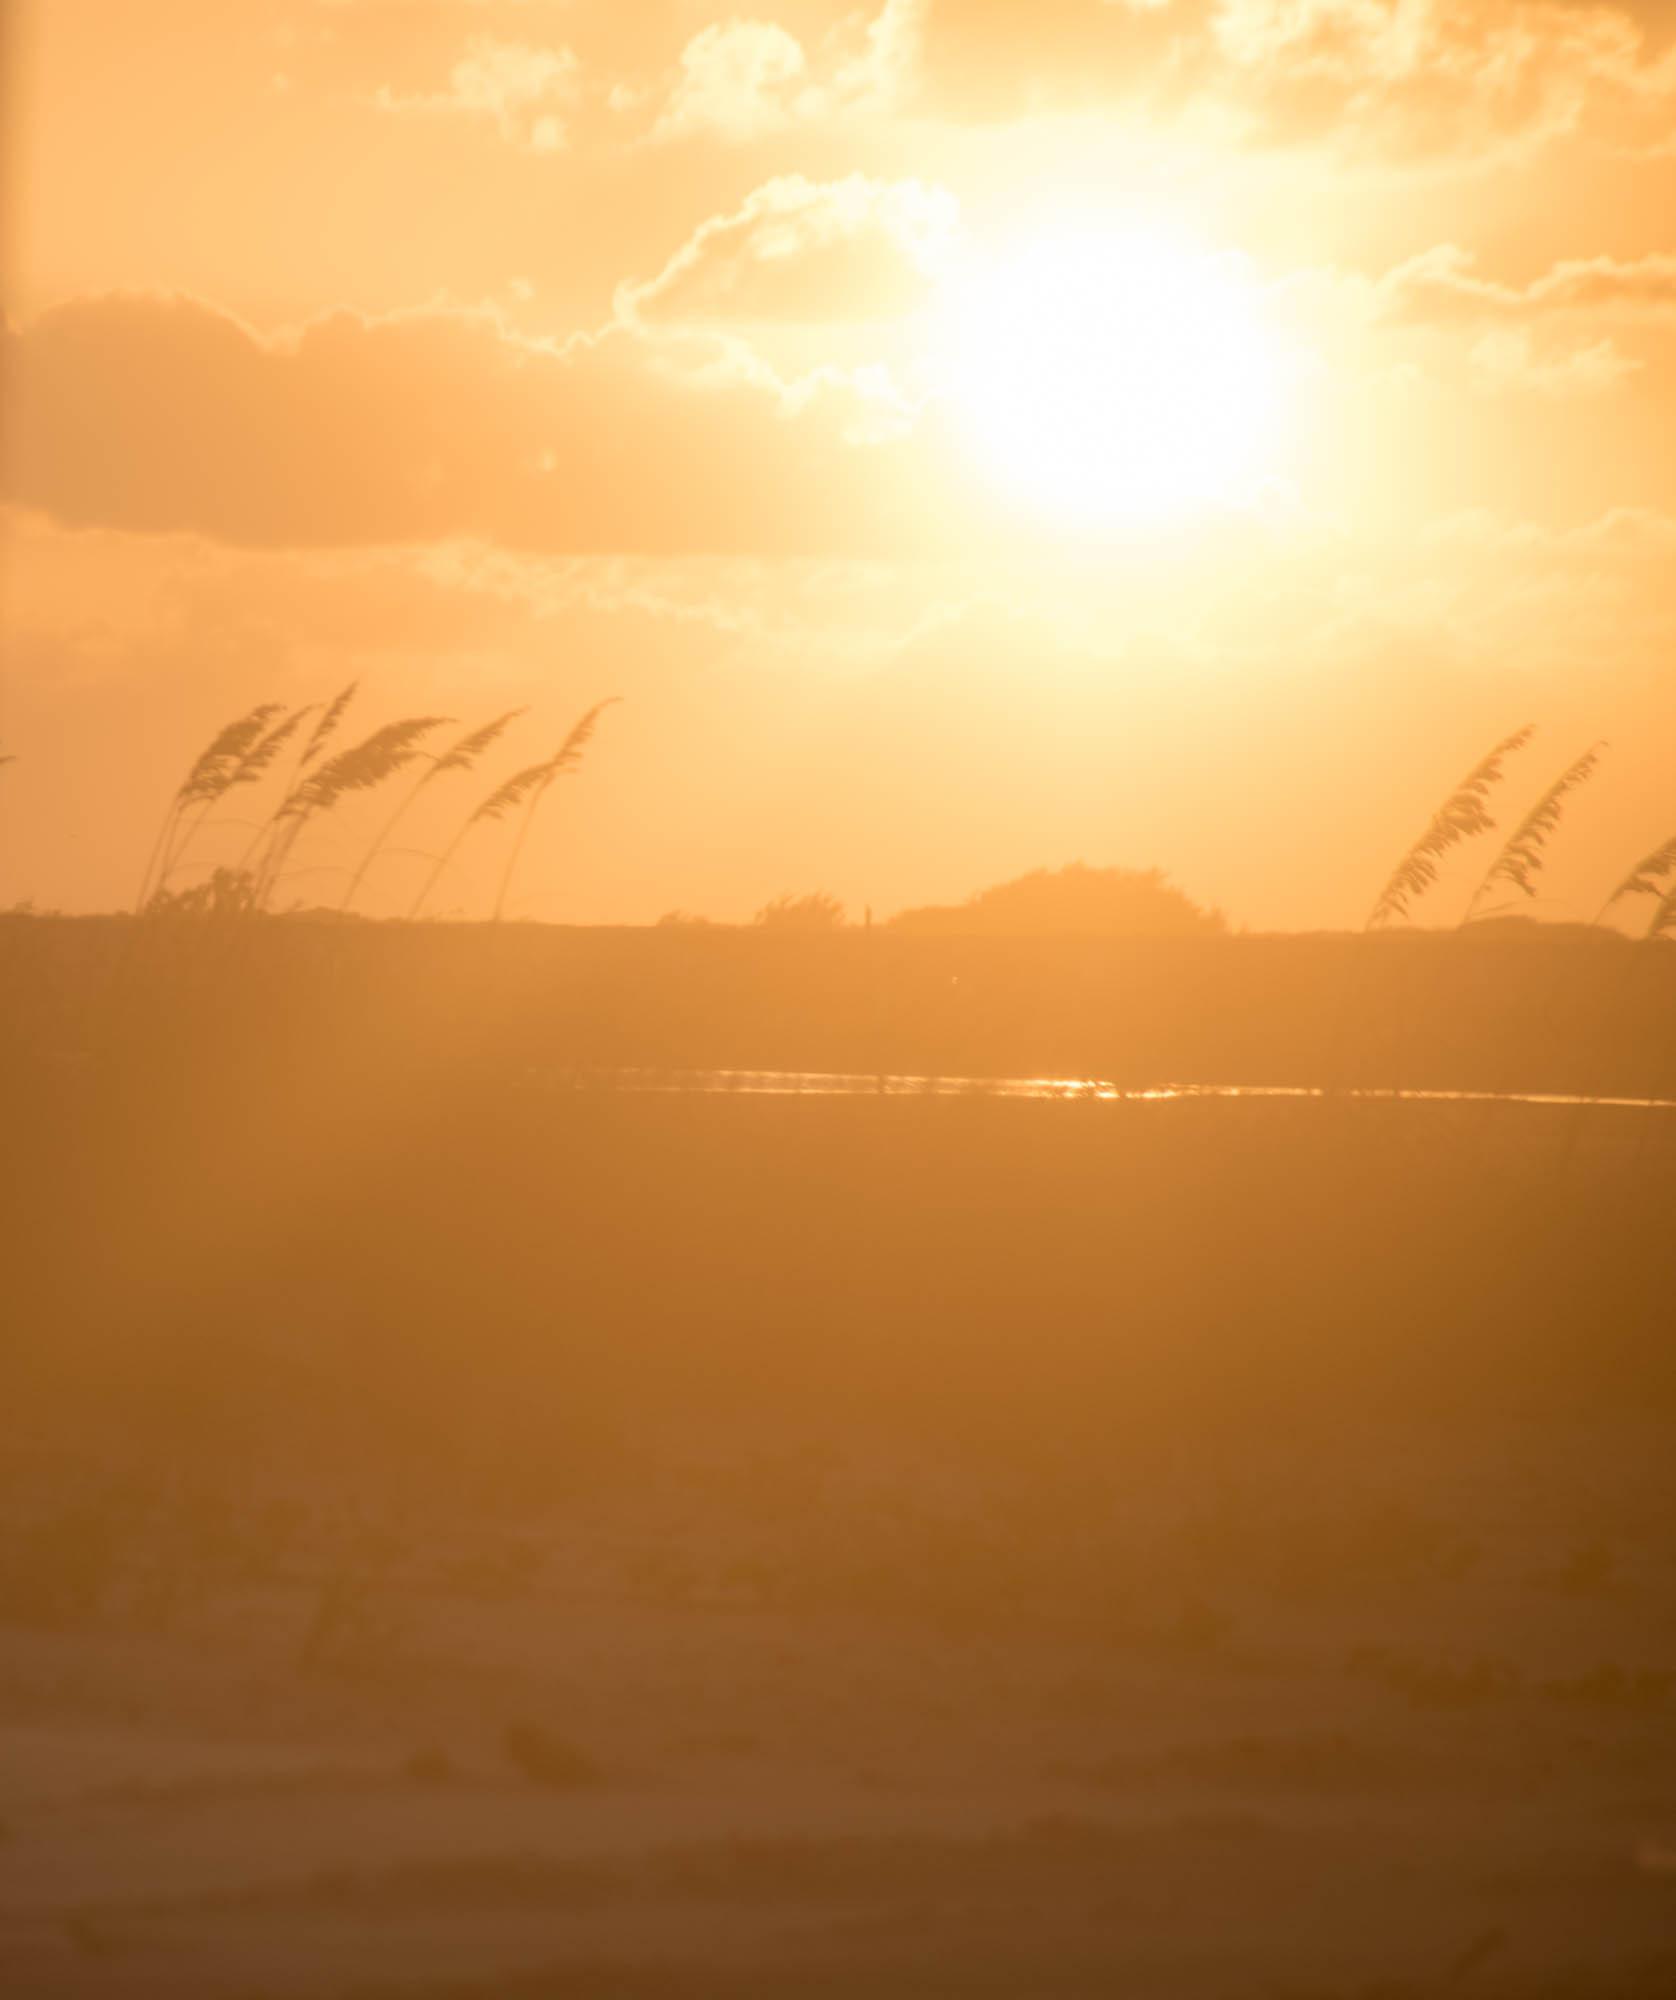 matagorda-beach-july-fourth-1